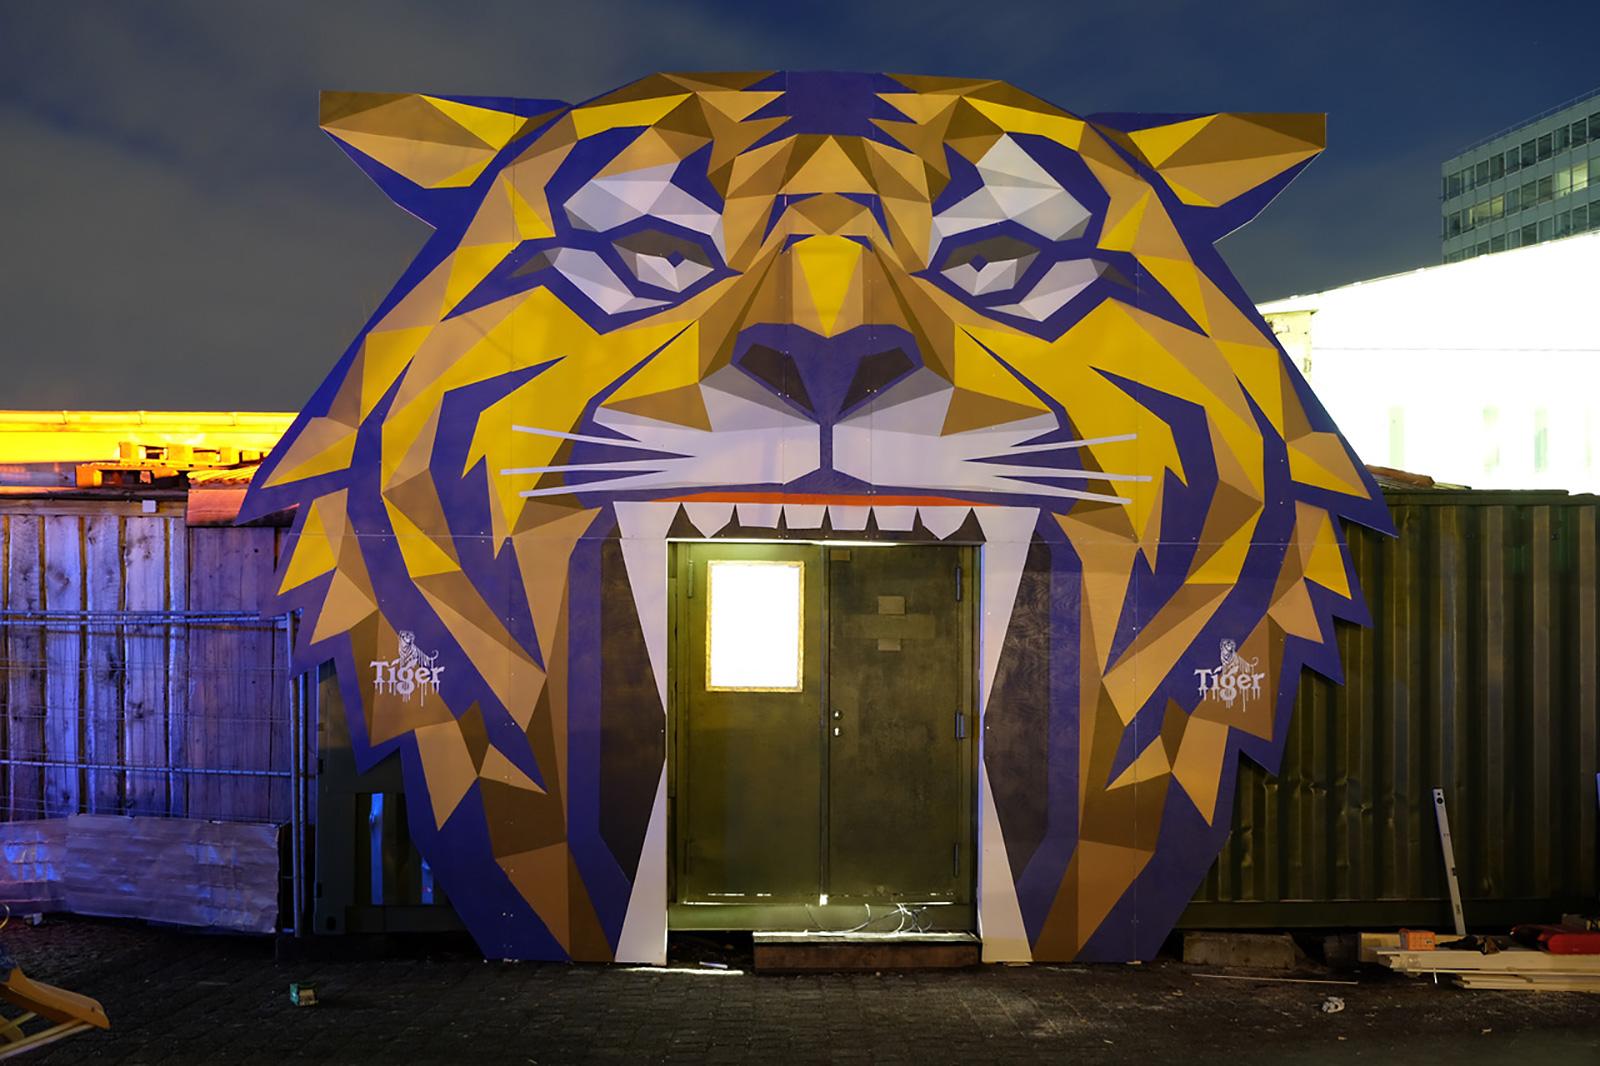 Tiger Bild Wandgestaltung polygon club eingang hamburg berlin